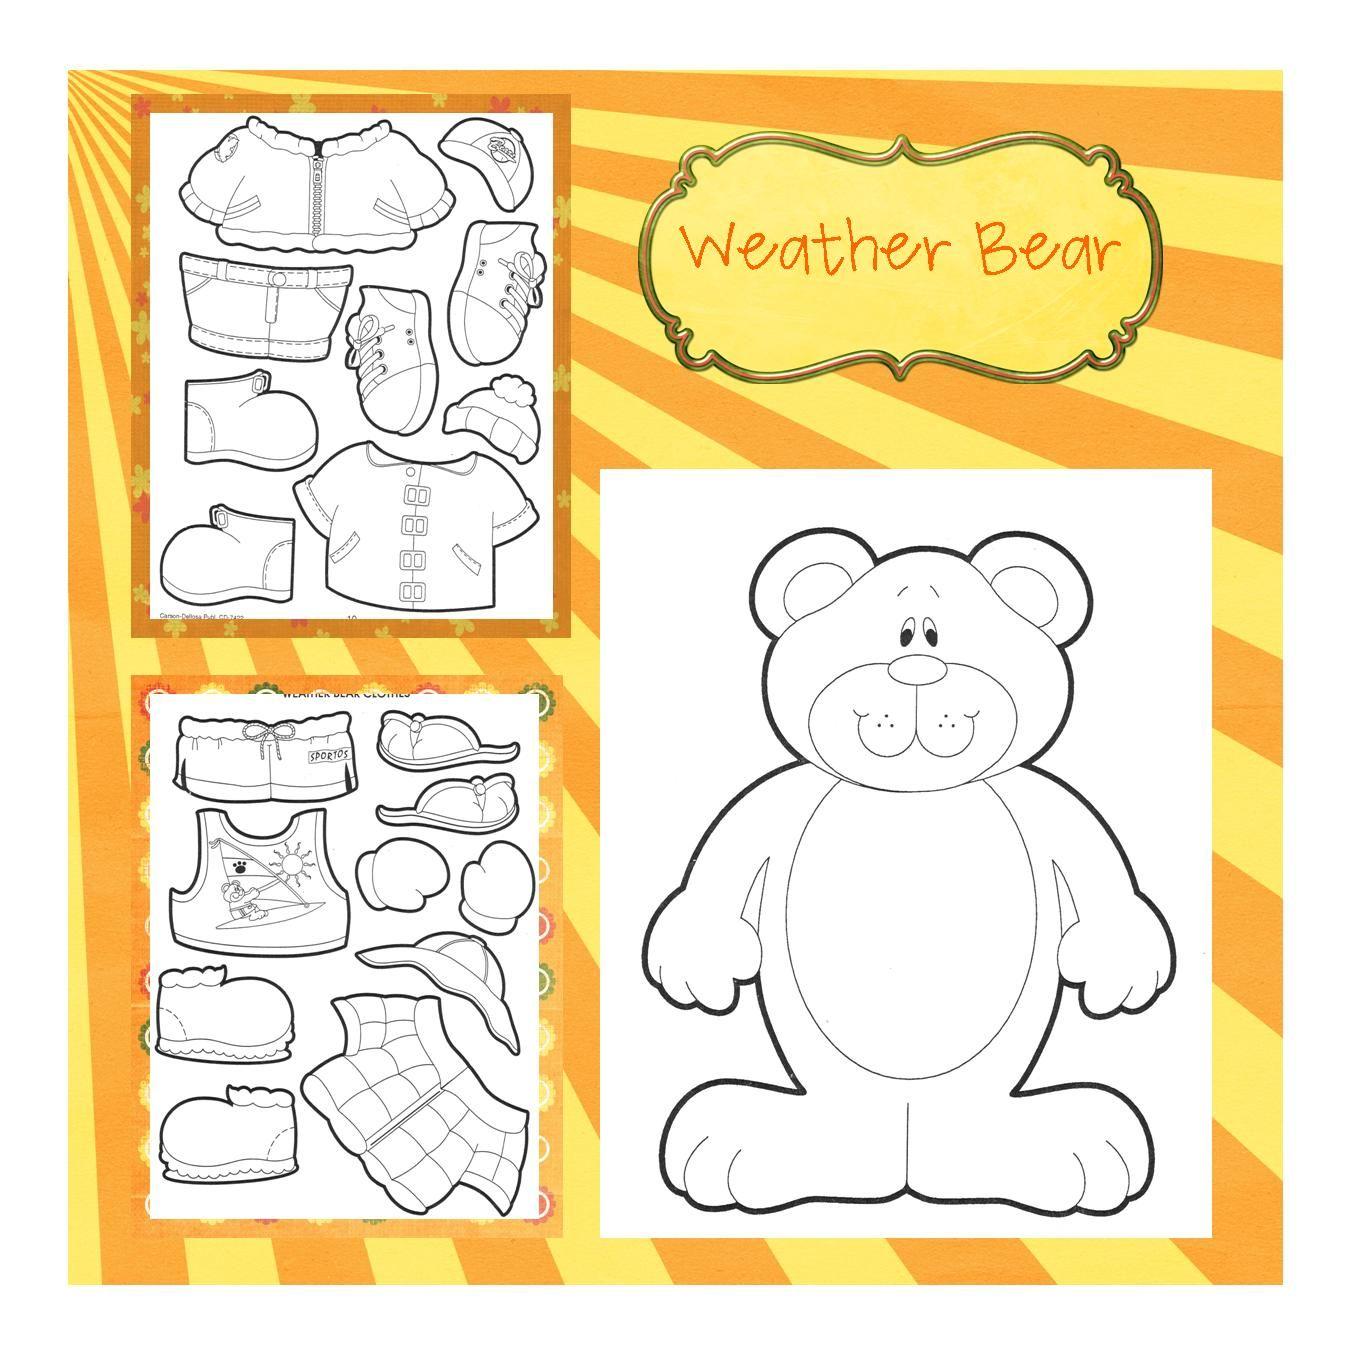 Xm Printable Guide Sea Bear Up Printable Weather Coupons Ntt Signs Radio Best Printable Dress Preschool Weather Bear Template Preschool Fun [ 1350 x 1350 Pixel ]